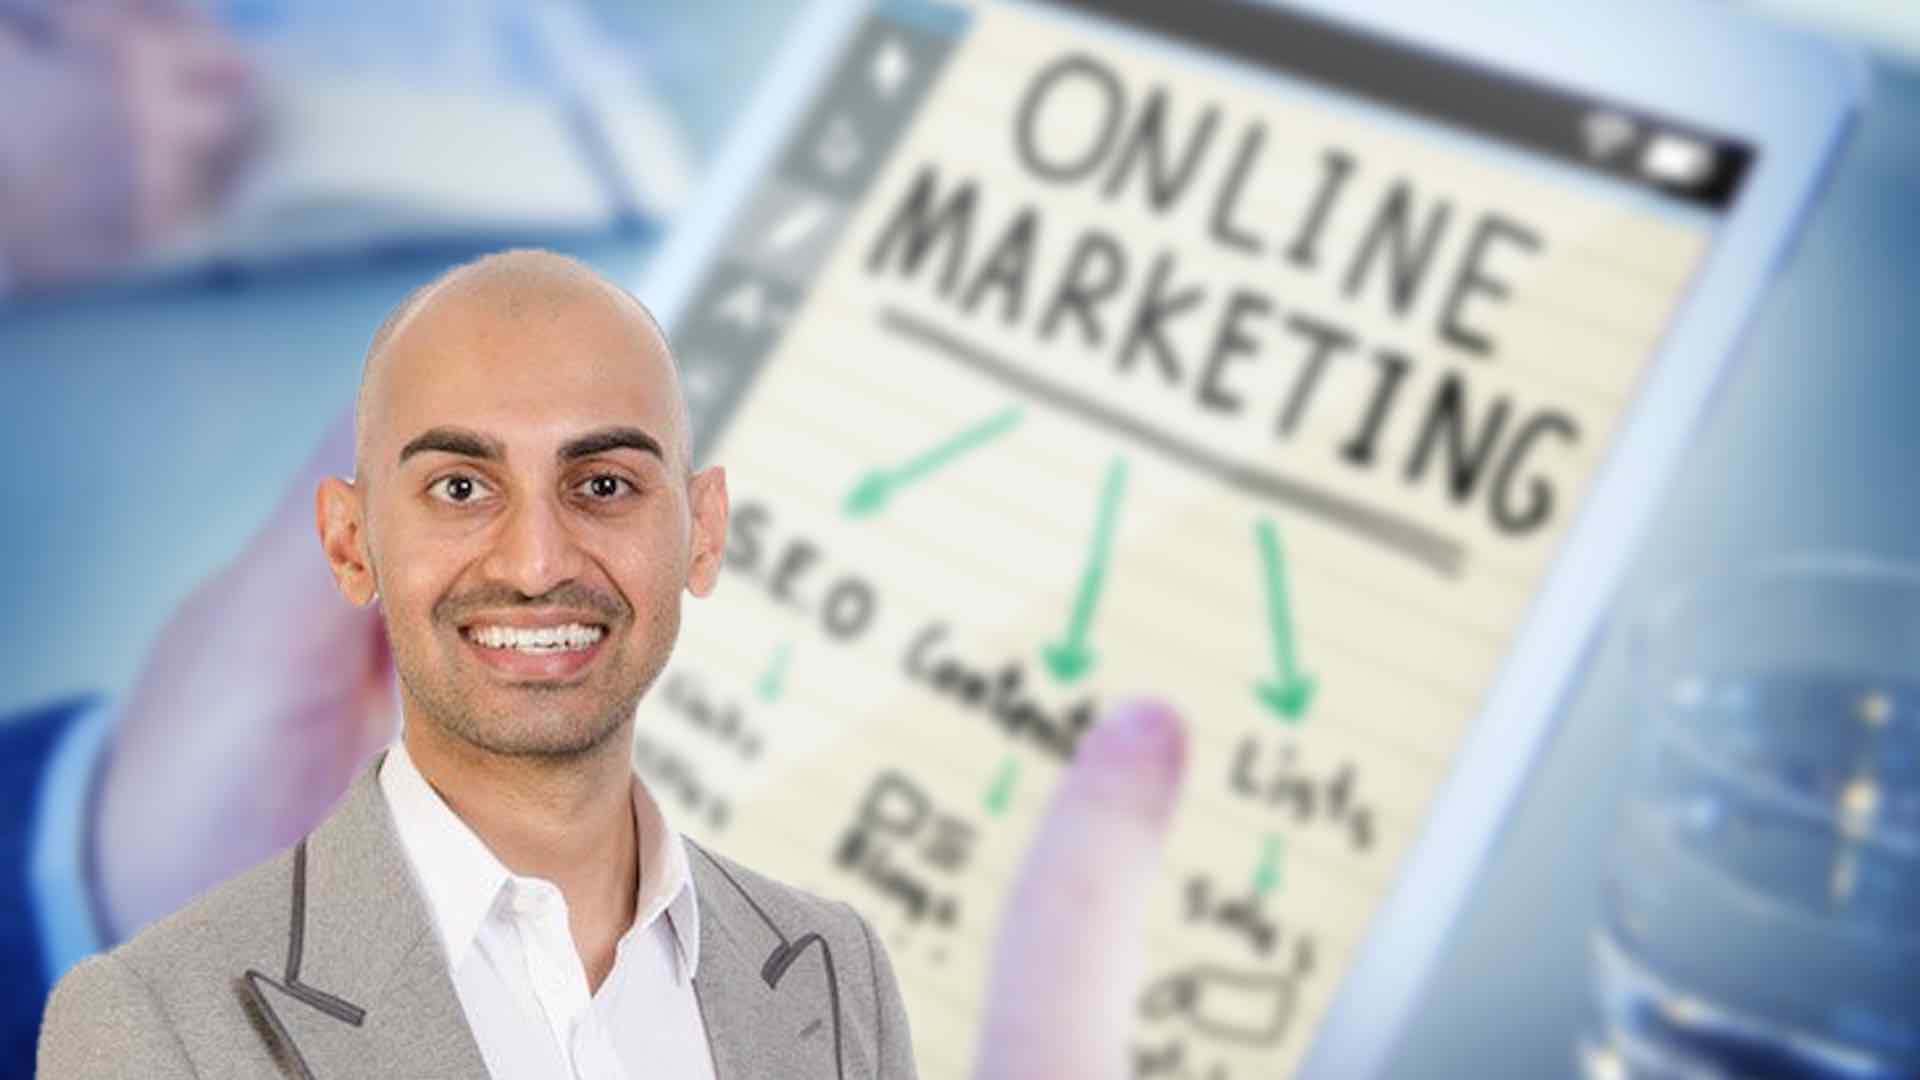 Neil Patel net worth digital marketing marketer